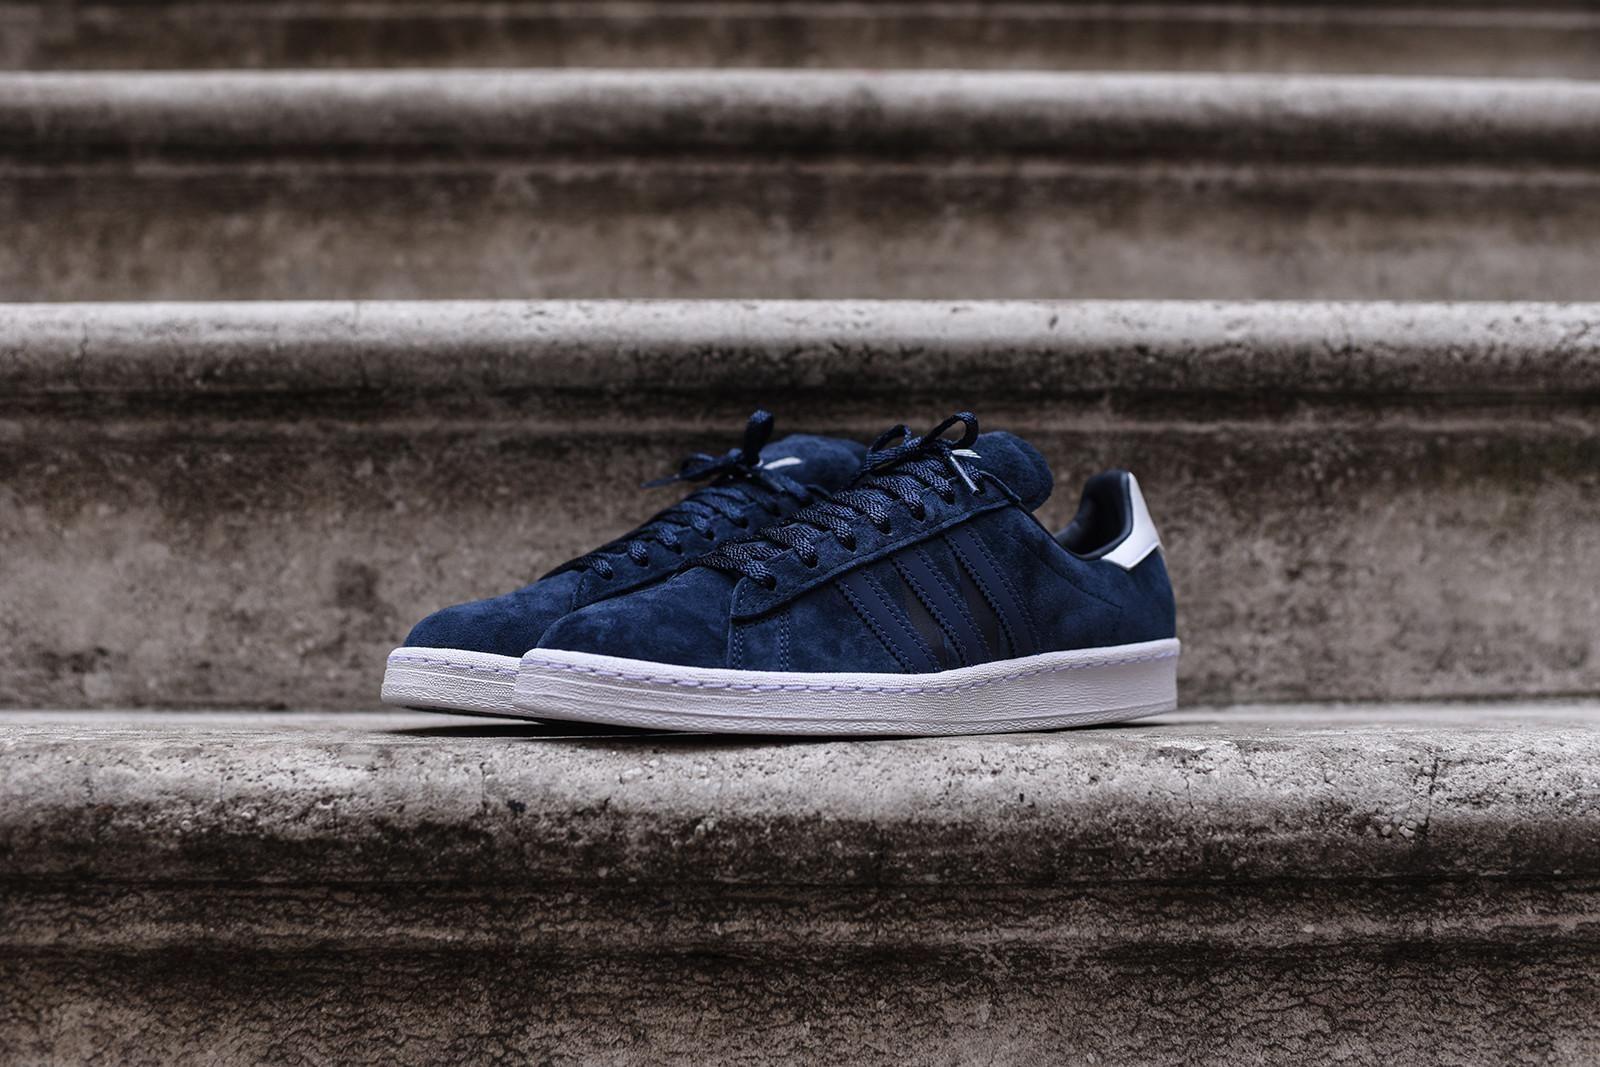 60832bed2e79 adidas Originals x White Mountaineering Campus 80 - Navy   Blue   White